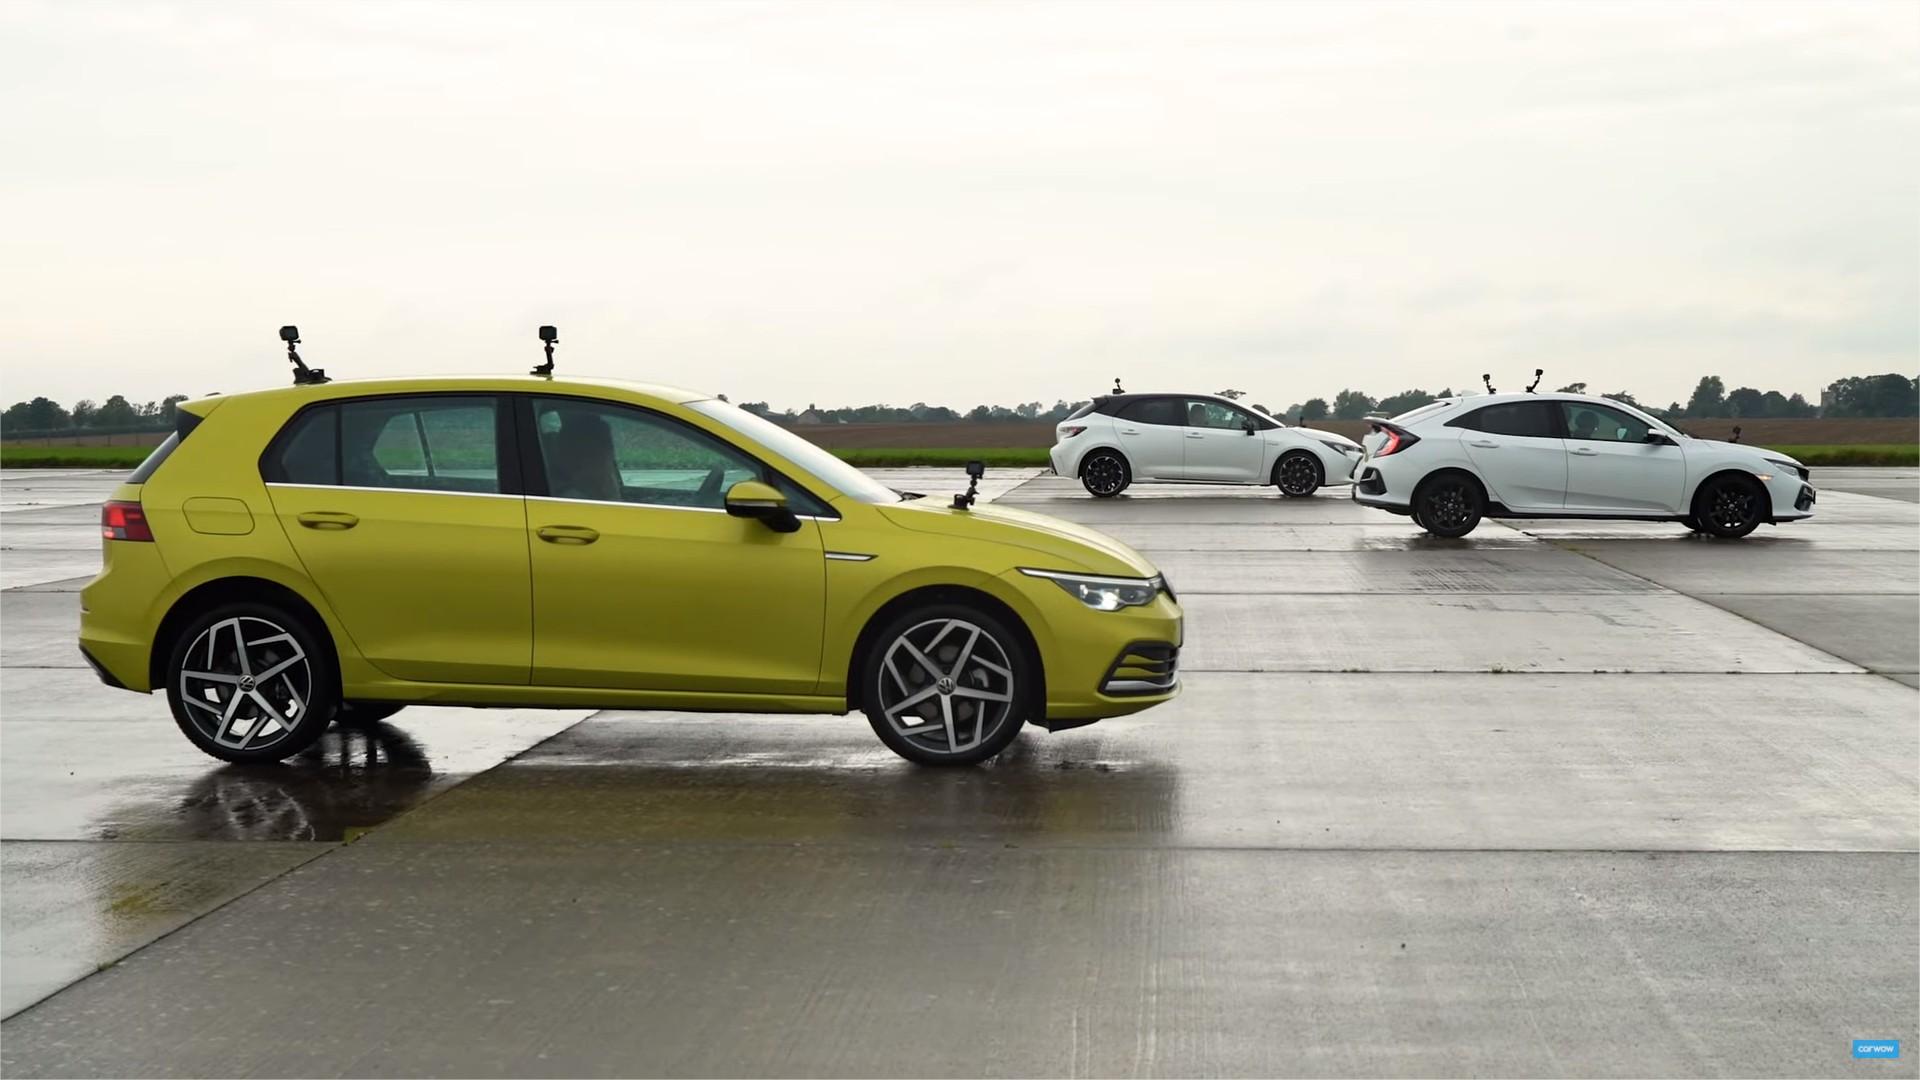 Toyota Corolla, Honda Civic ή VW Golf: Ποιό κερδίζει τη μάχη της ταχύτητας; [vid]